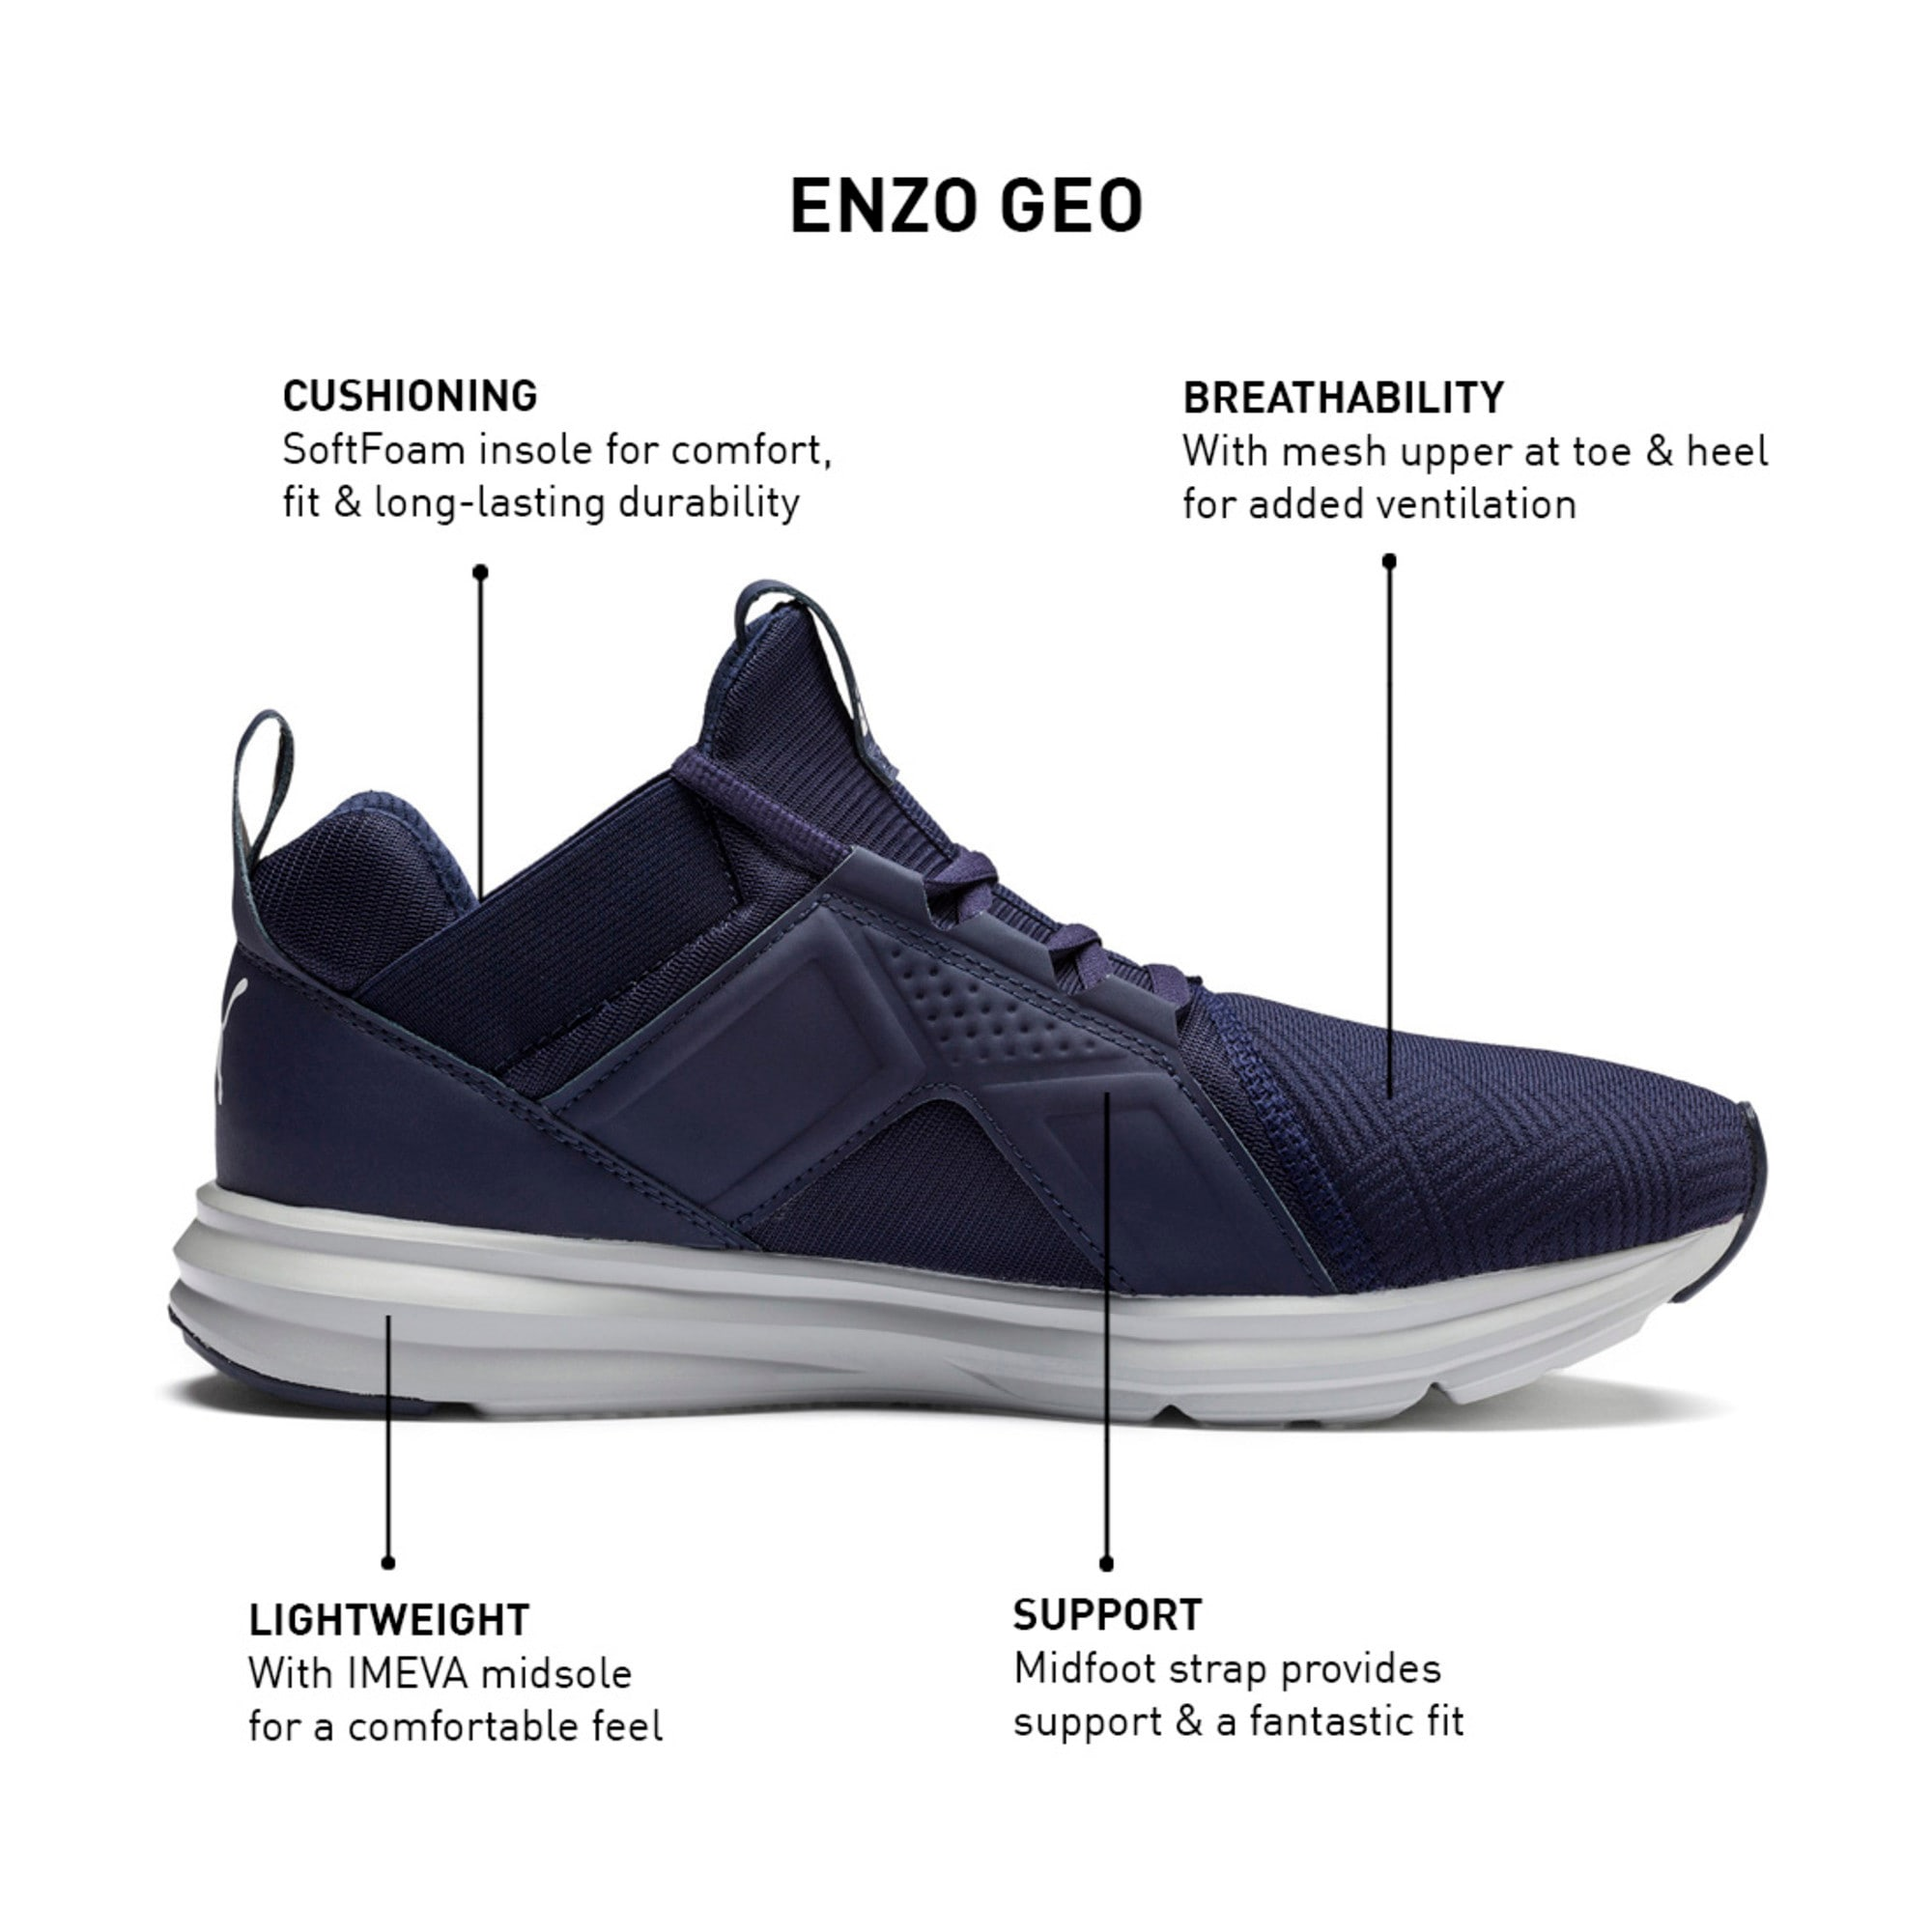 Thumbnail 7 of Enzo Geo Men's Running Shoes, Peacoat, medium-IND